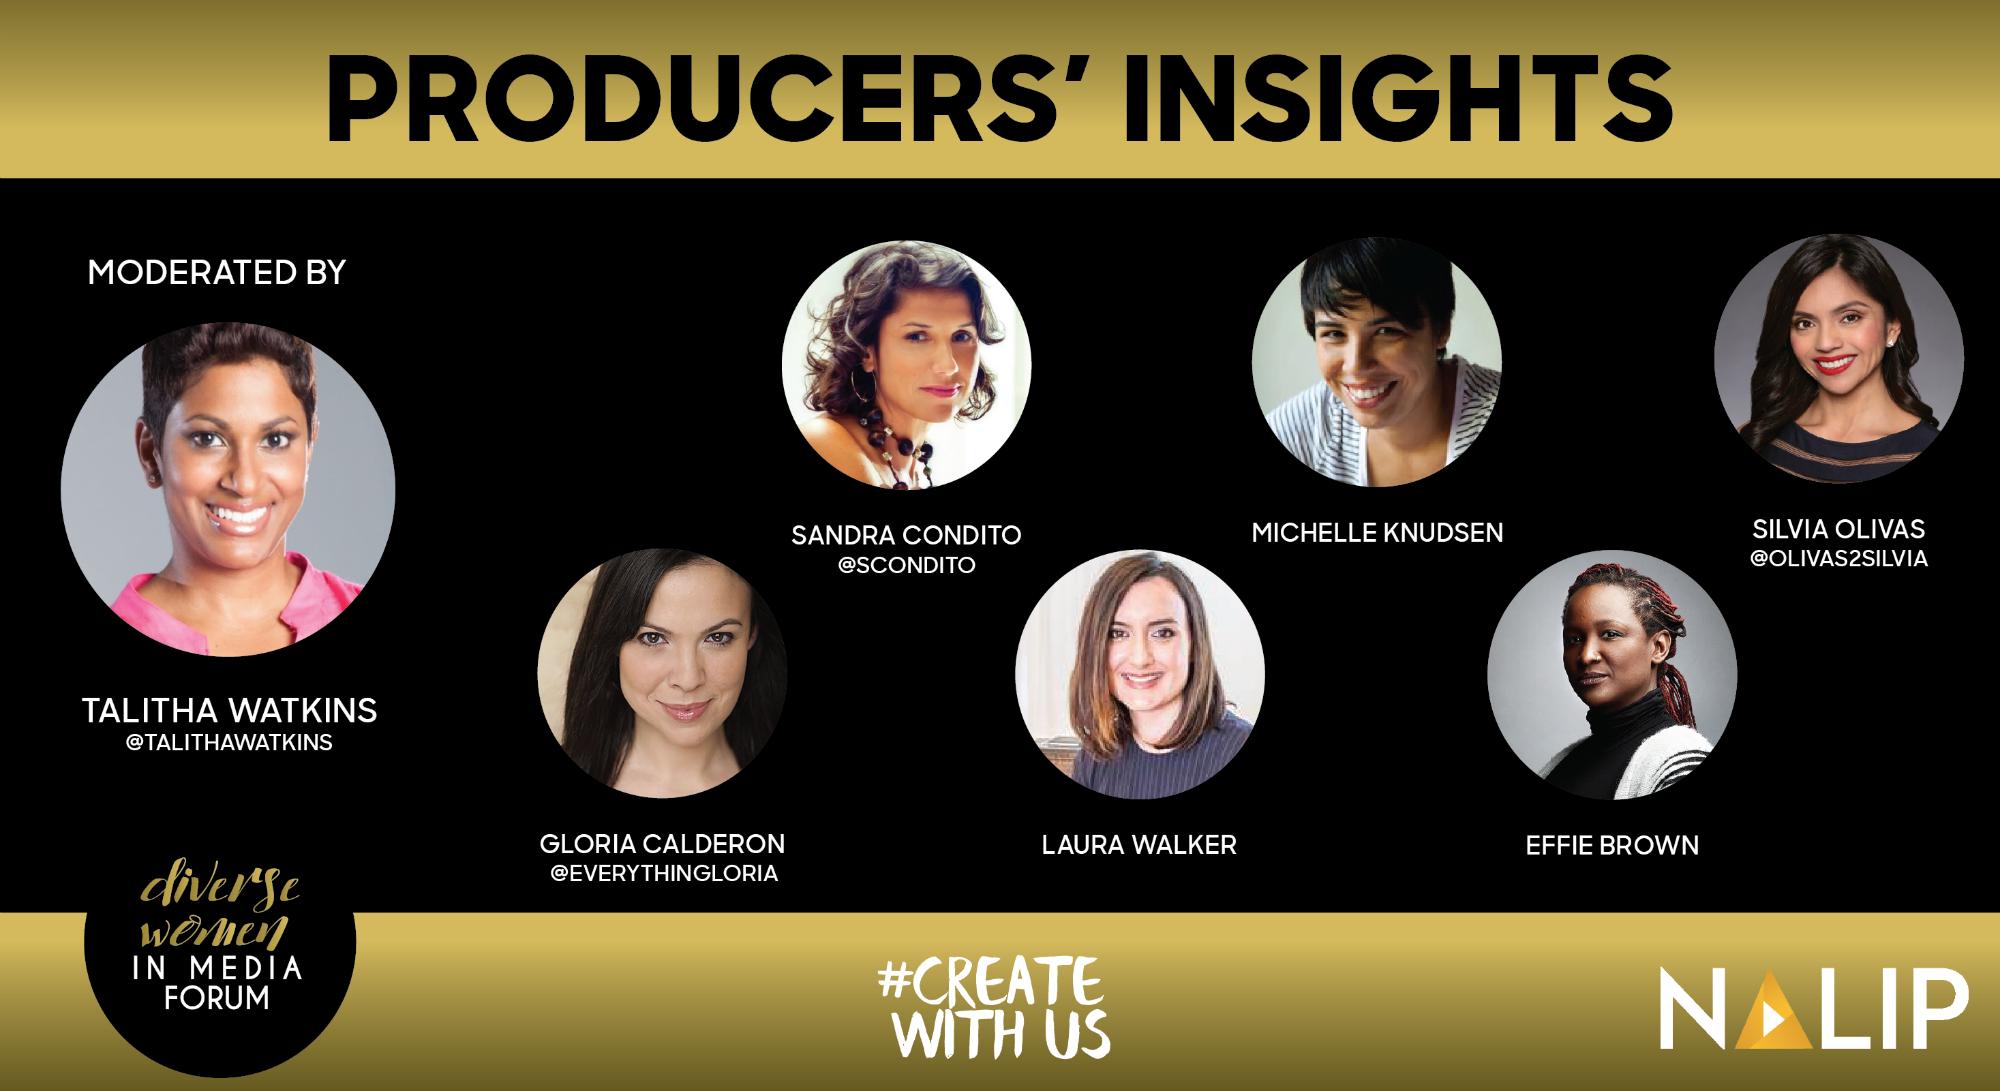 Meet the Women Speaking at the Diverse Women in Media Forum